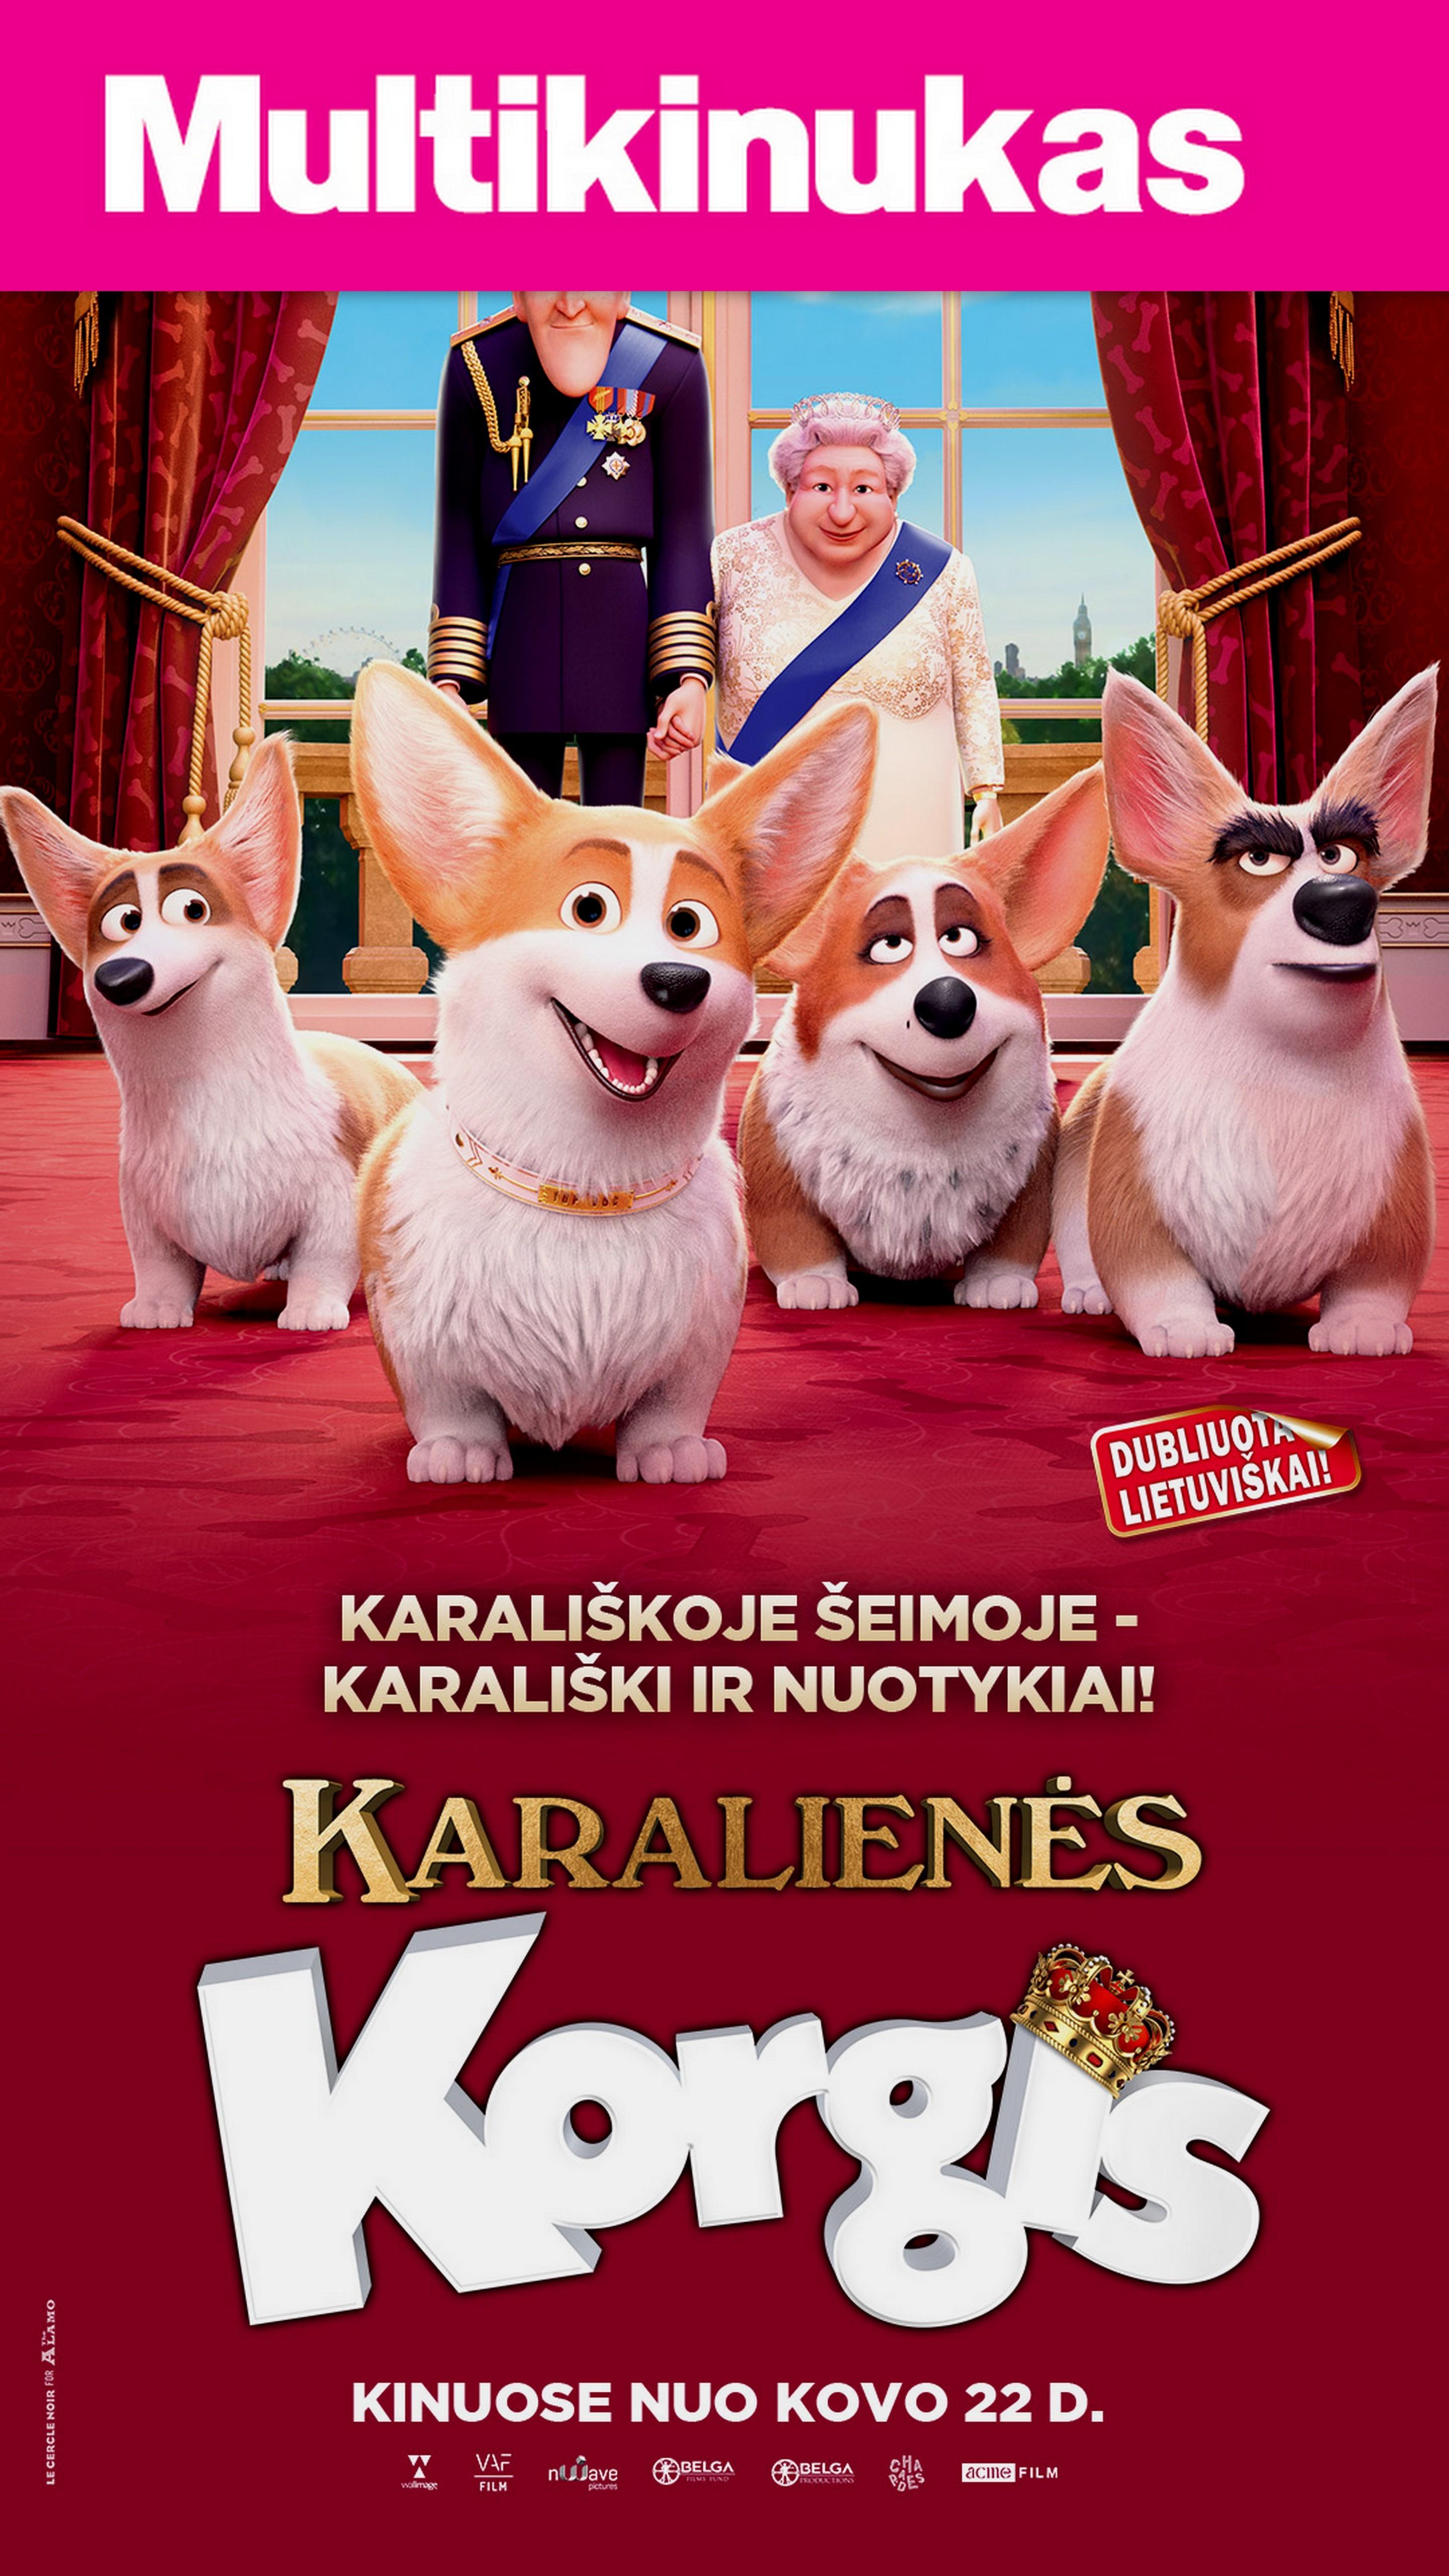 Multikinukas: KARALIENĖS KORGIS (Queen's Corgi)